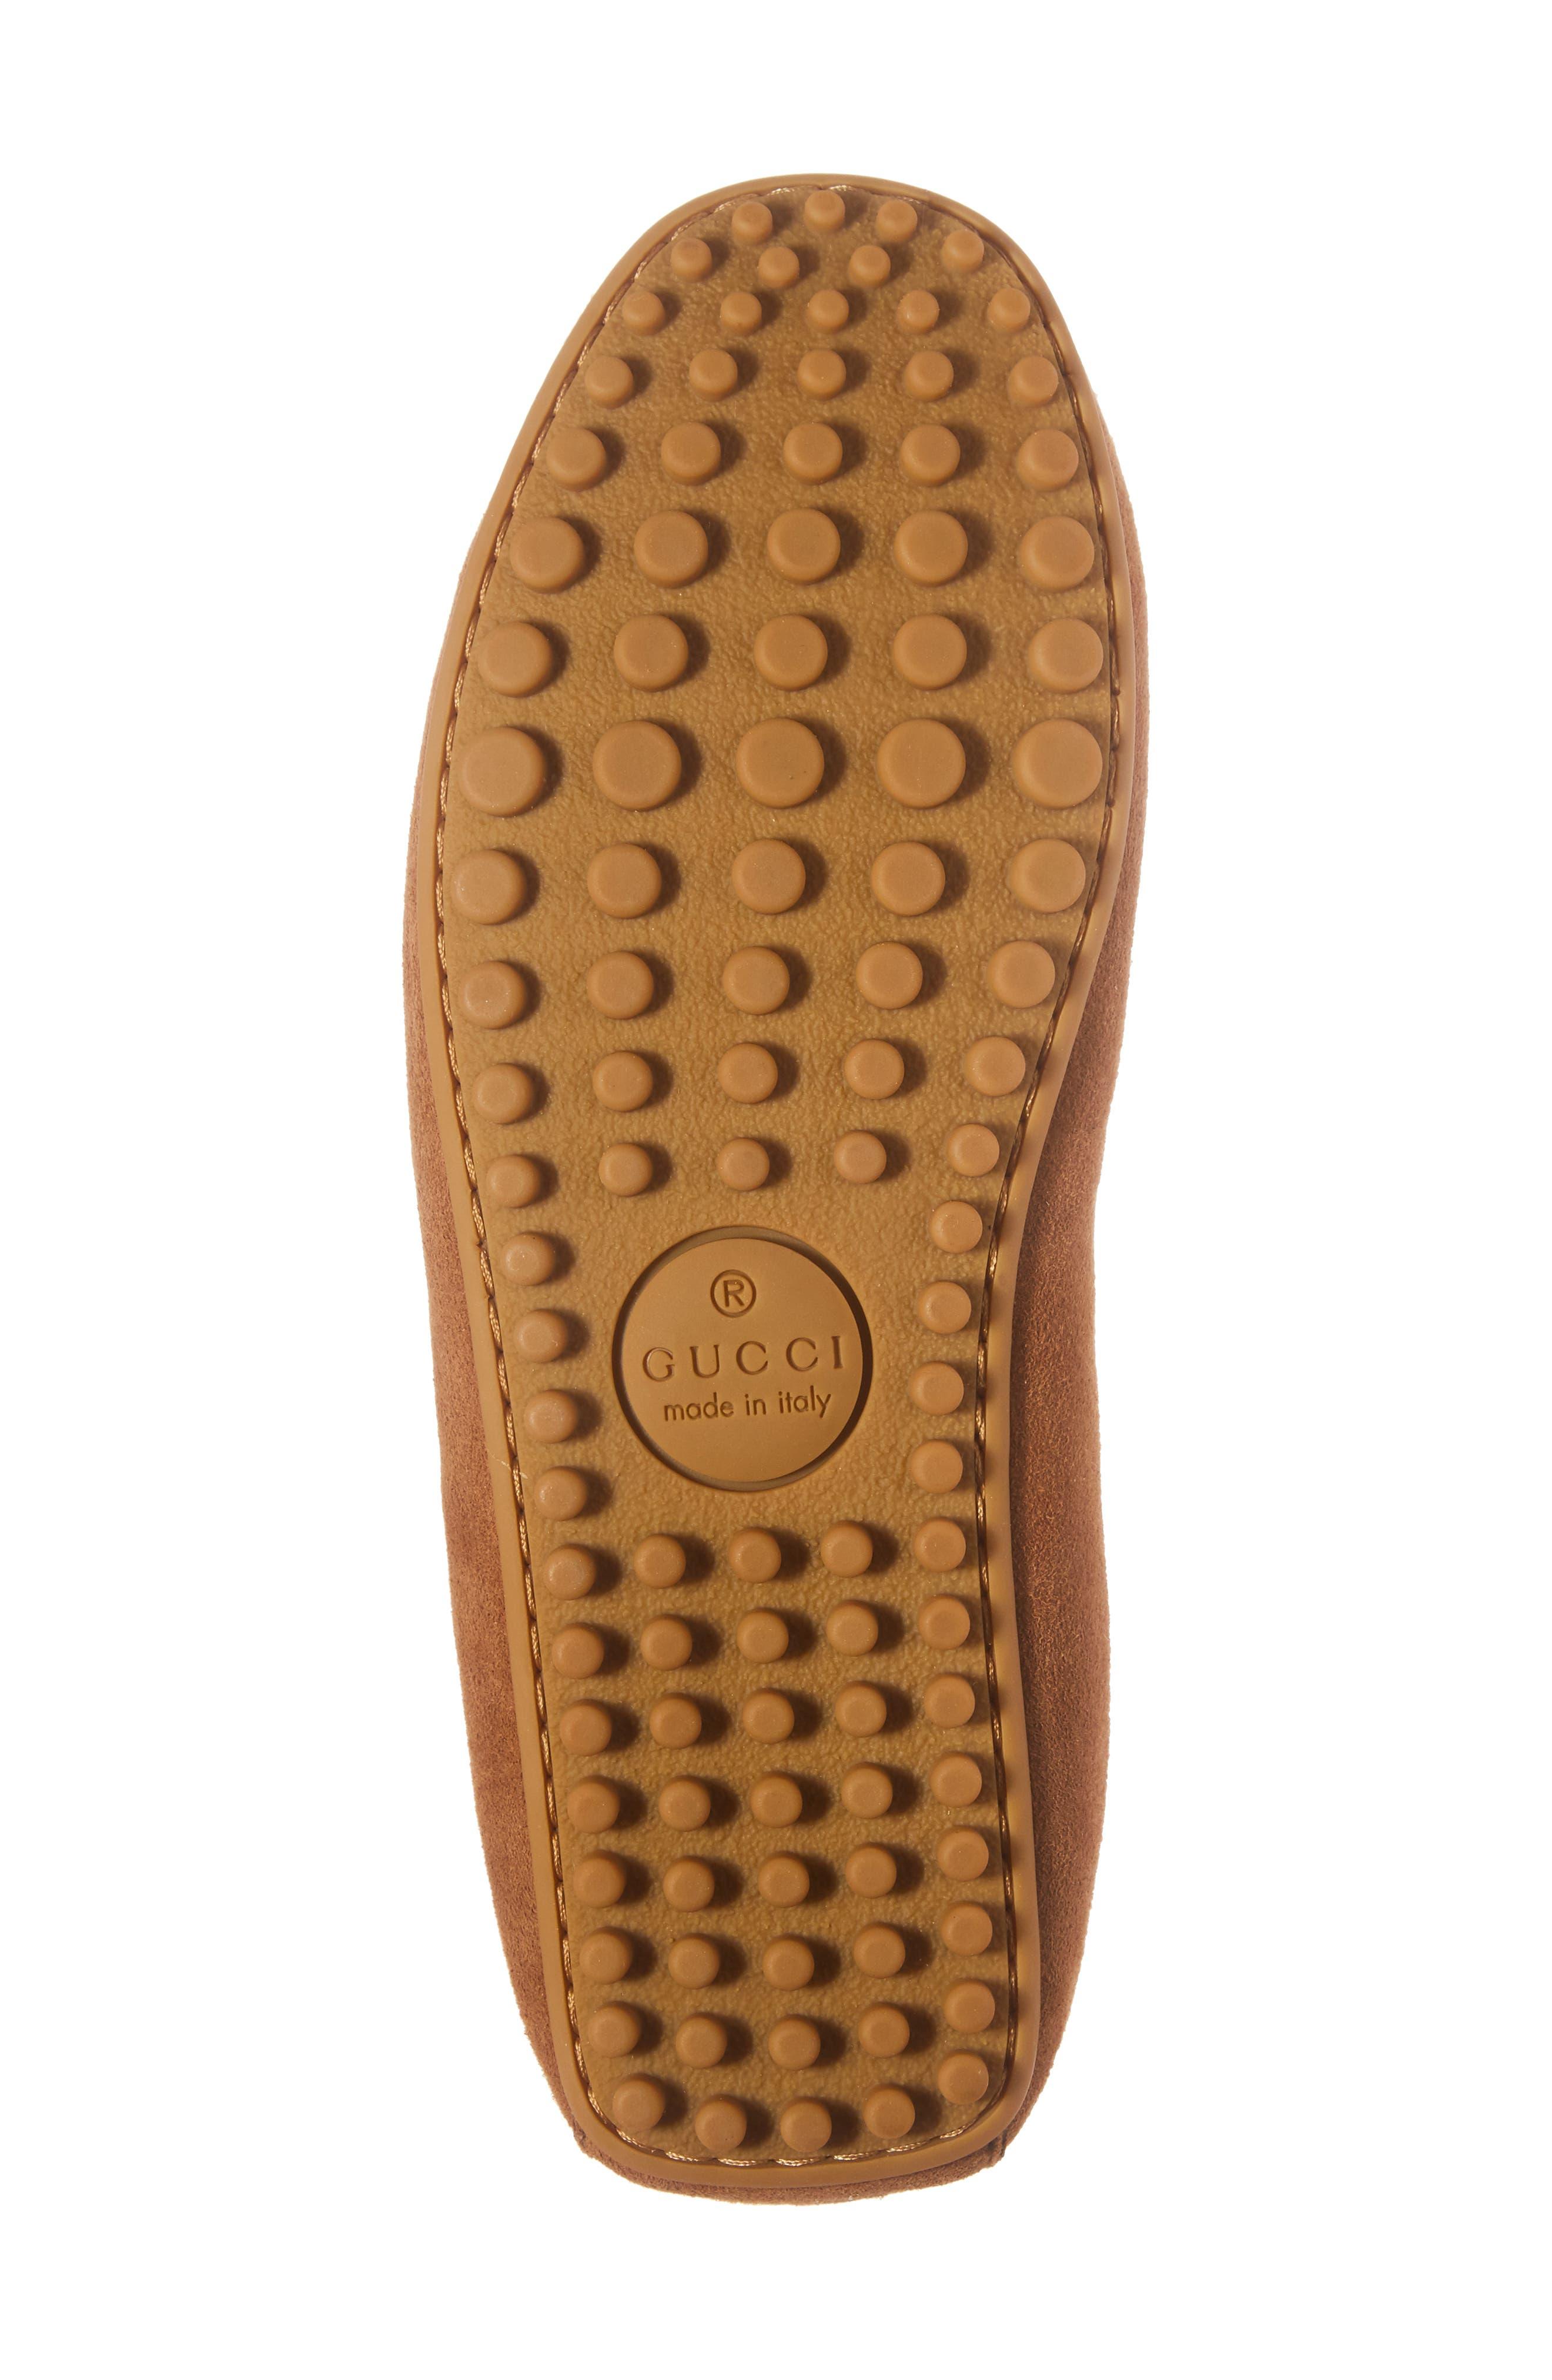 Driving Shoe with Genuine Shearling,                             Alternate thumbnail 6, color,                             Dark Tan